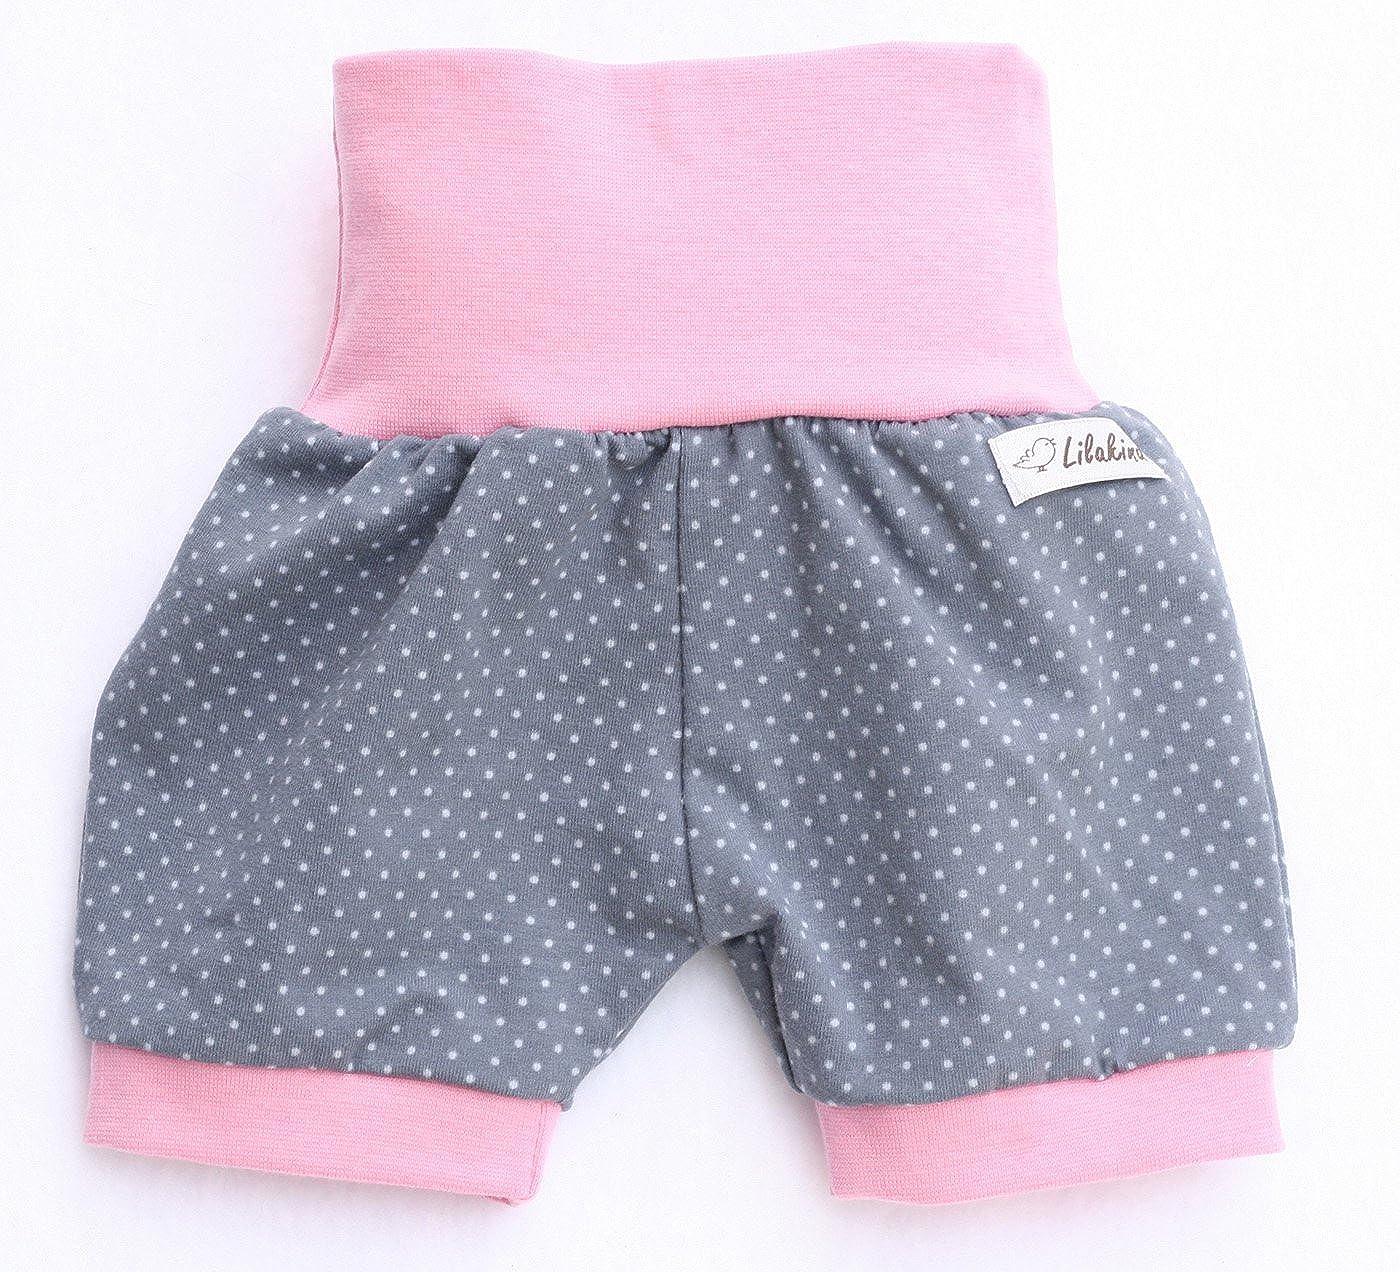 Lilakind Kurze M/ädchen Pumphose Shorts Buxe Sommerhose Punkte Made in Germany